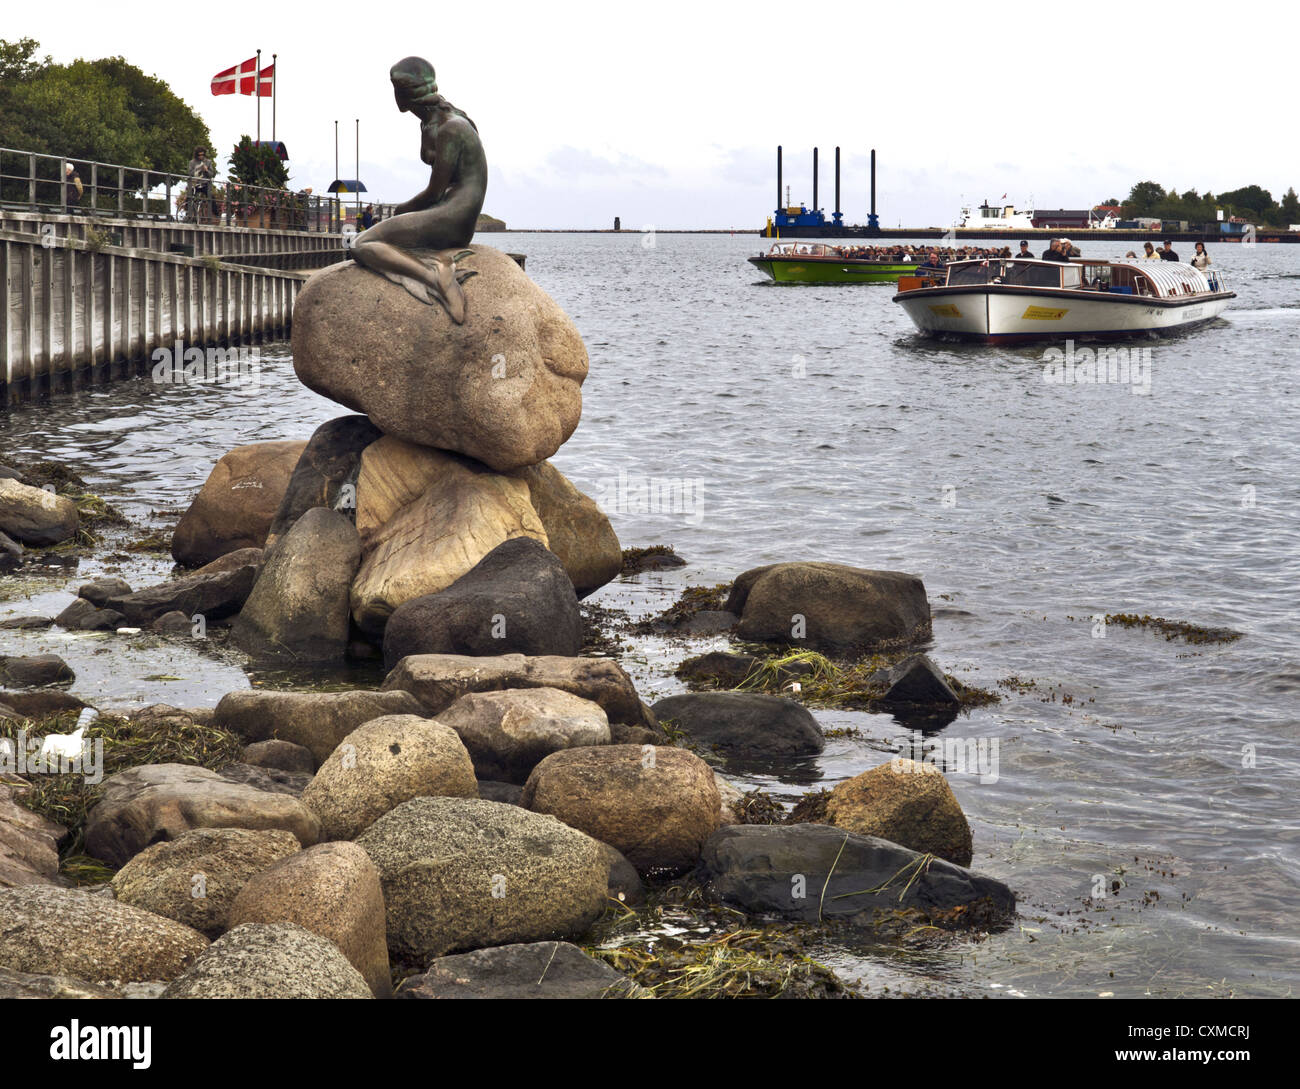 Tourist boats approaching the Little Mermaid, Copenhagen harbour, Denmark Stock Photo